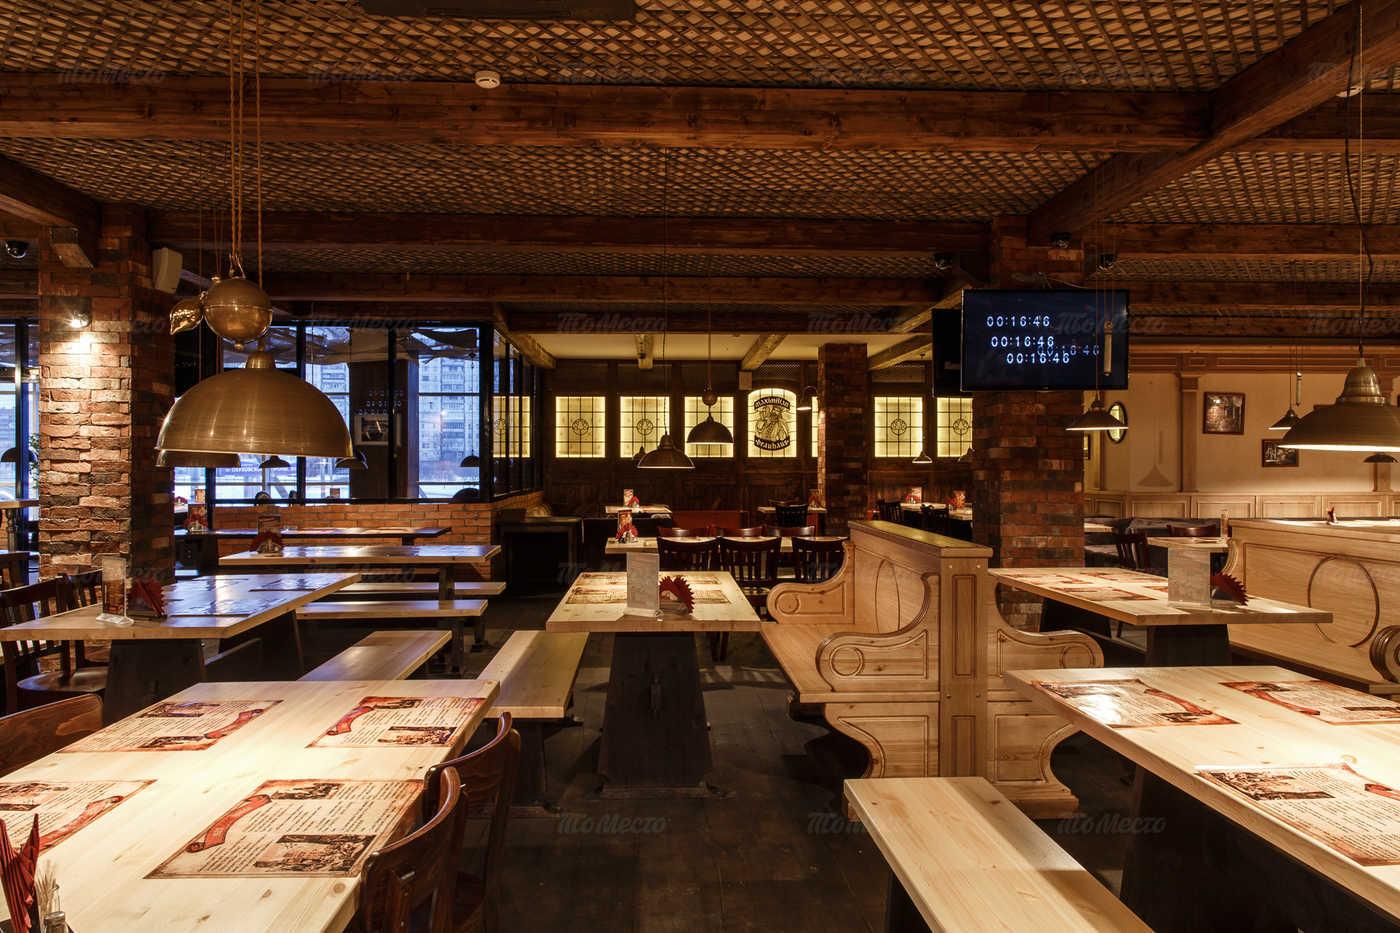 Меню пивного ресторана Max Beer House (Макс Бир Хаус) на Тепловозной улице